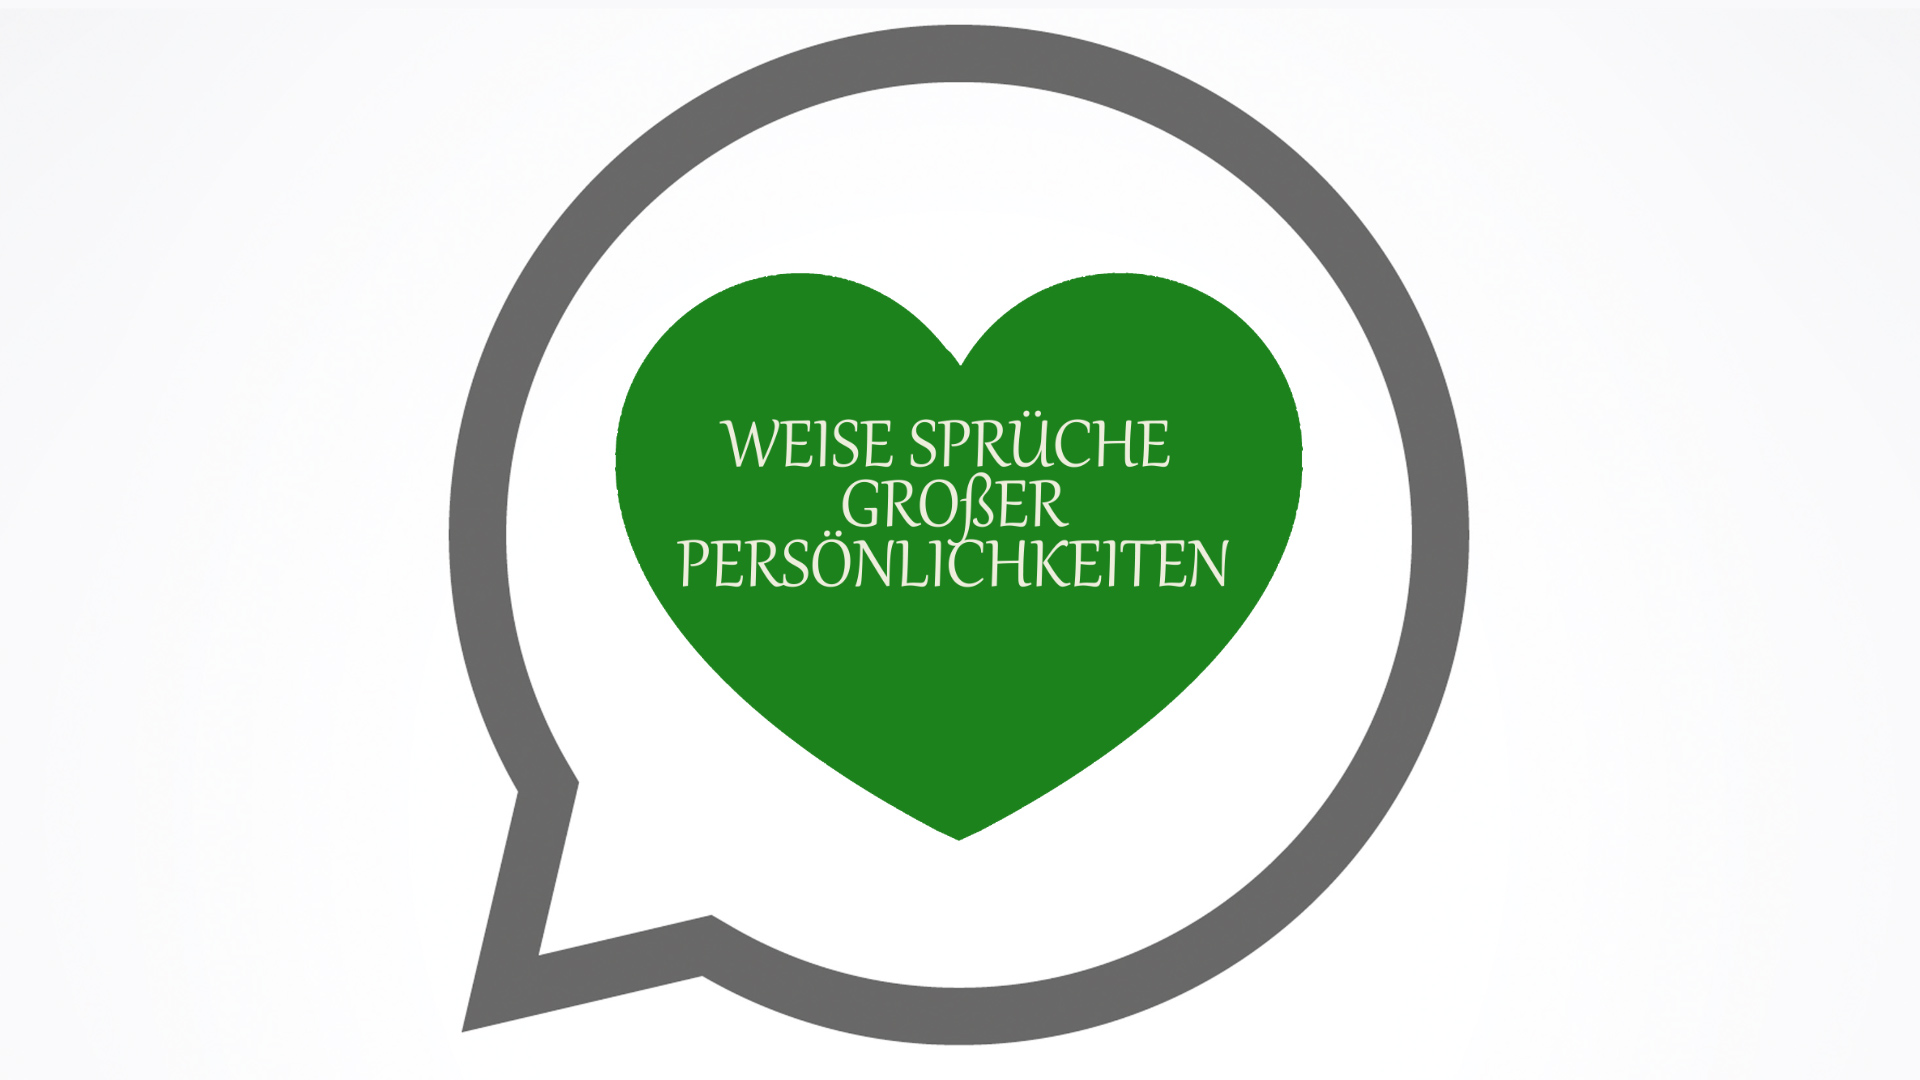 Whatsapp Sprüche Berühmte Zitate